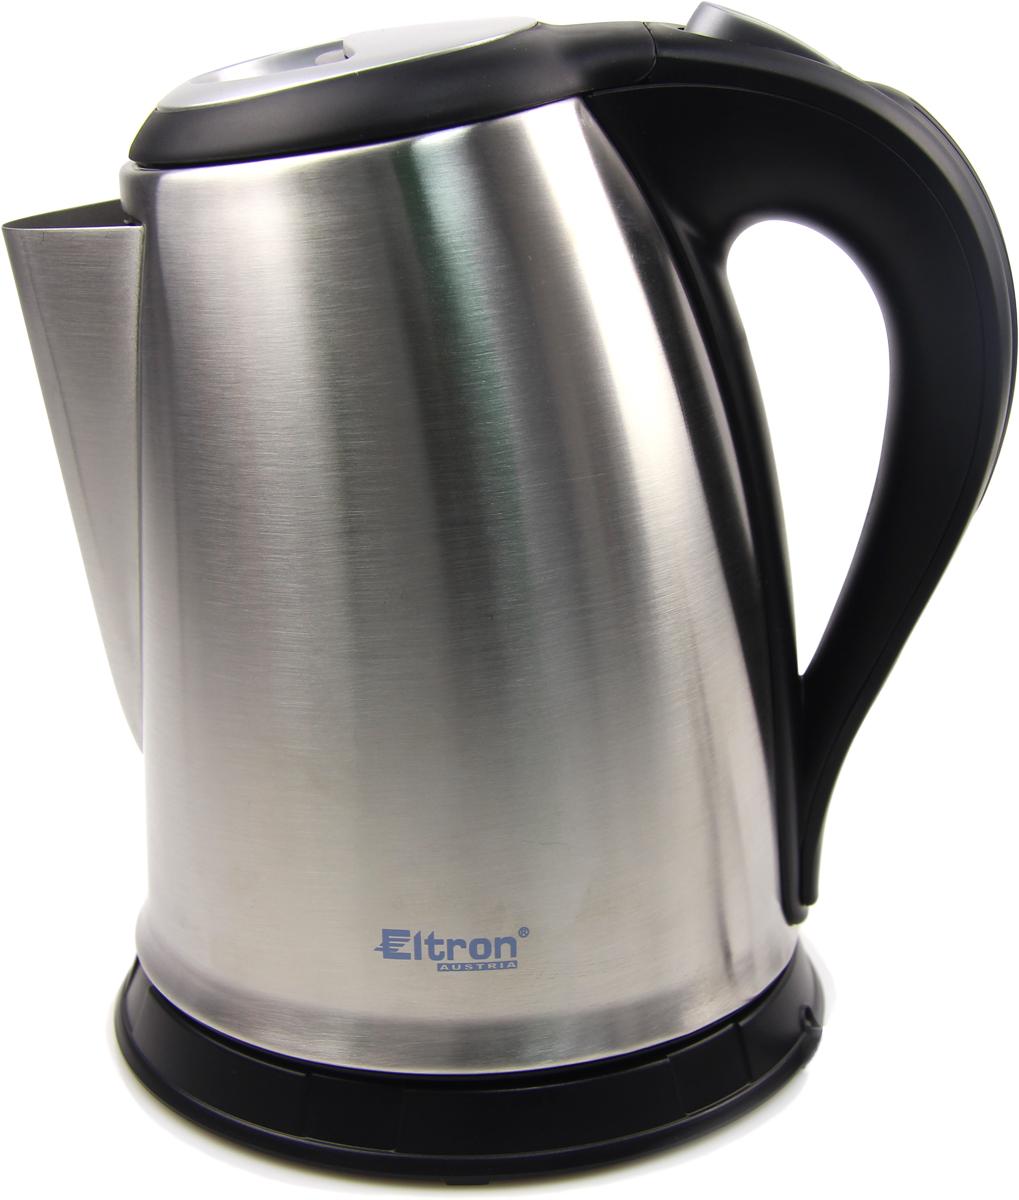 Eltron 6676, Silver электрический чайник цена и фото